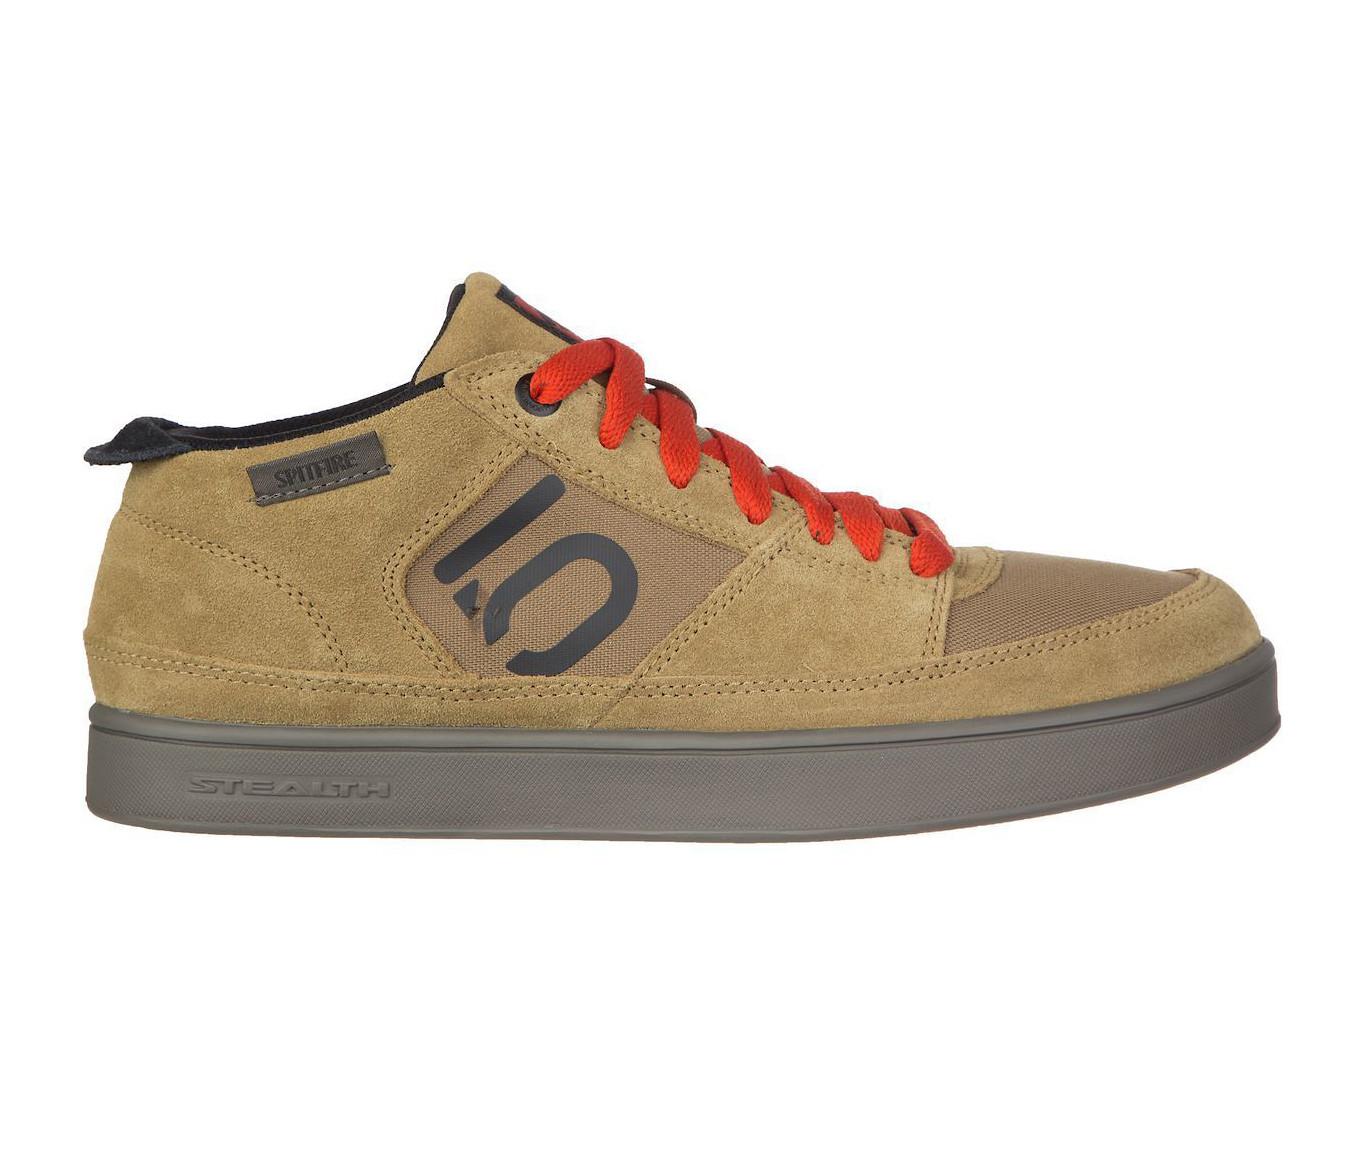 Five Ten Spitfire Flat Pedal Shoe